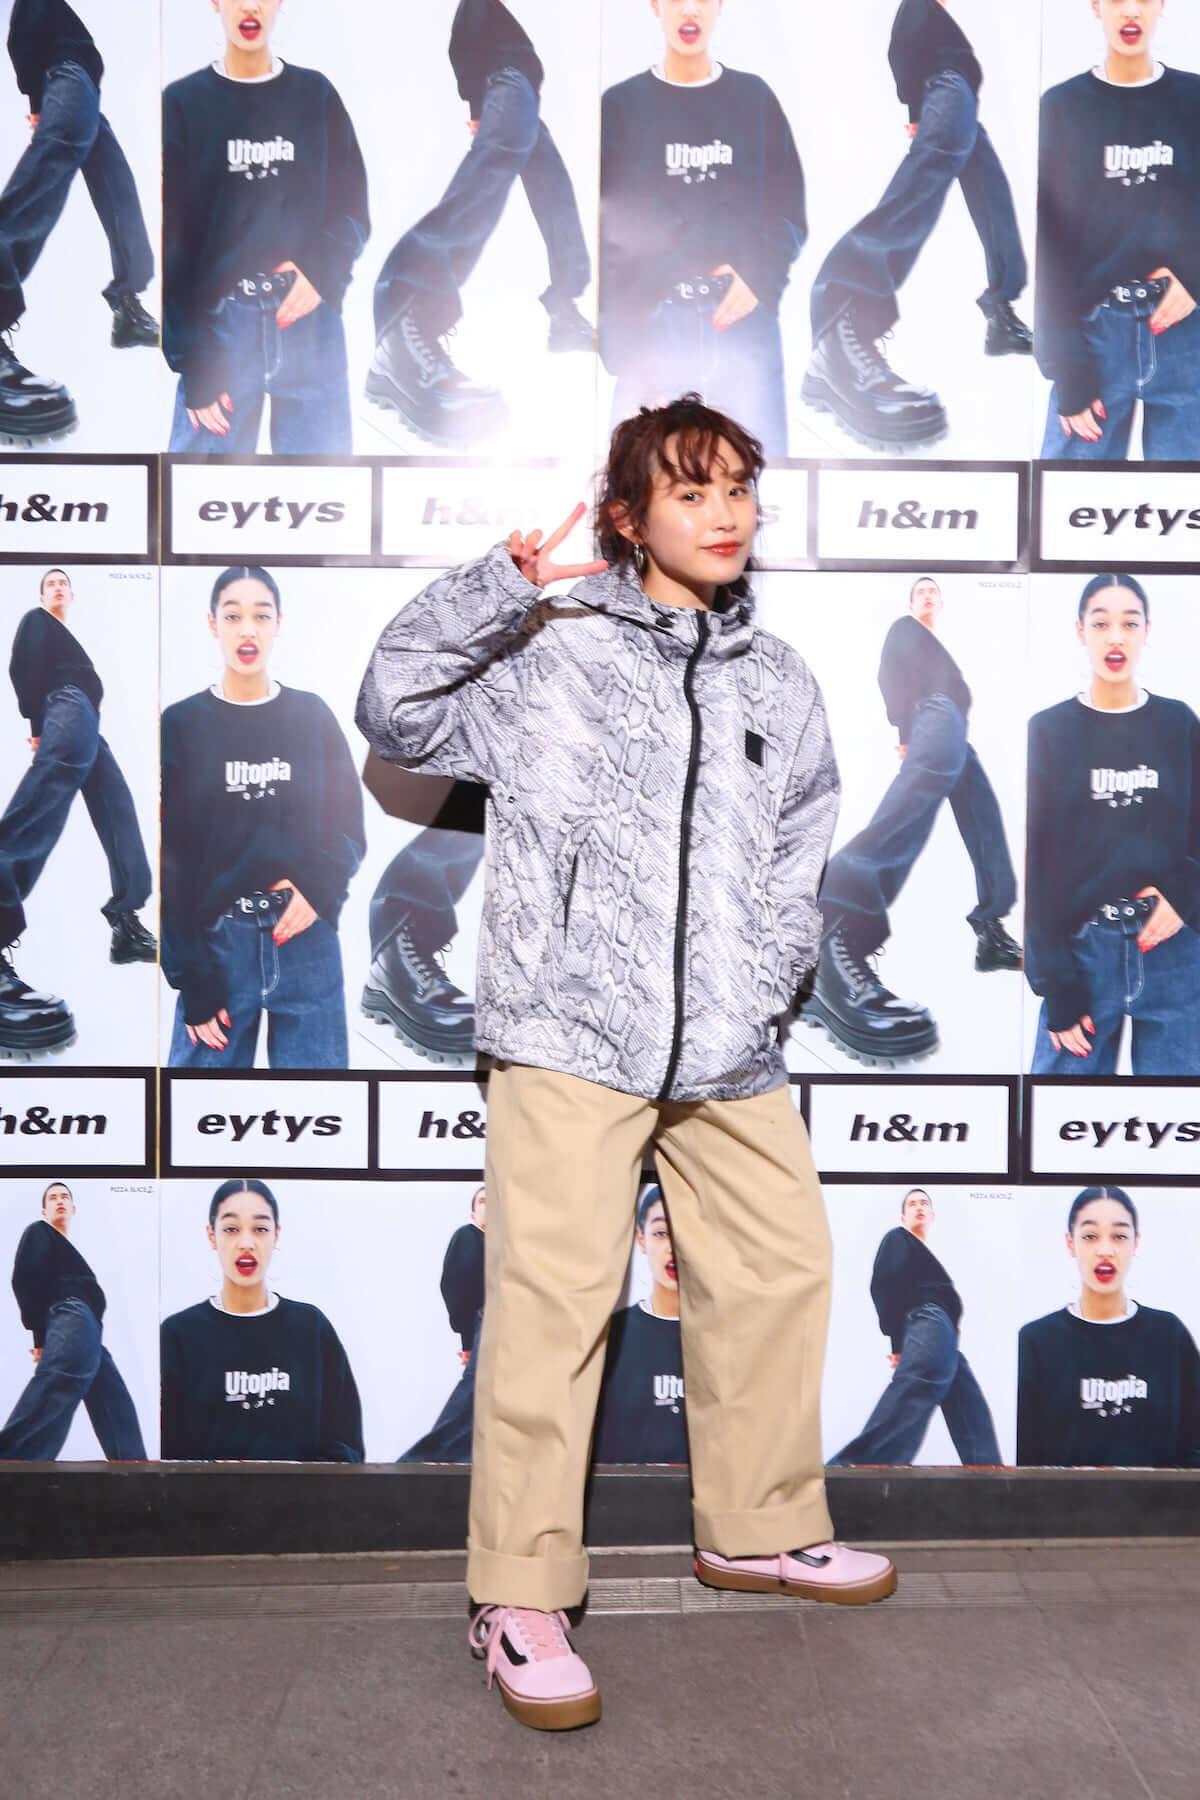 Eytys×H&Mのコラボコレクションが本日より発売開始 life-fashion190124-hm-eytys-6-1200x1800